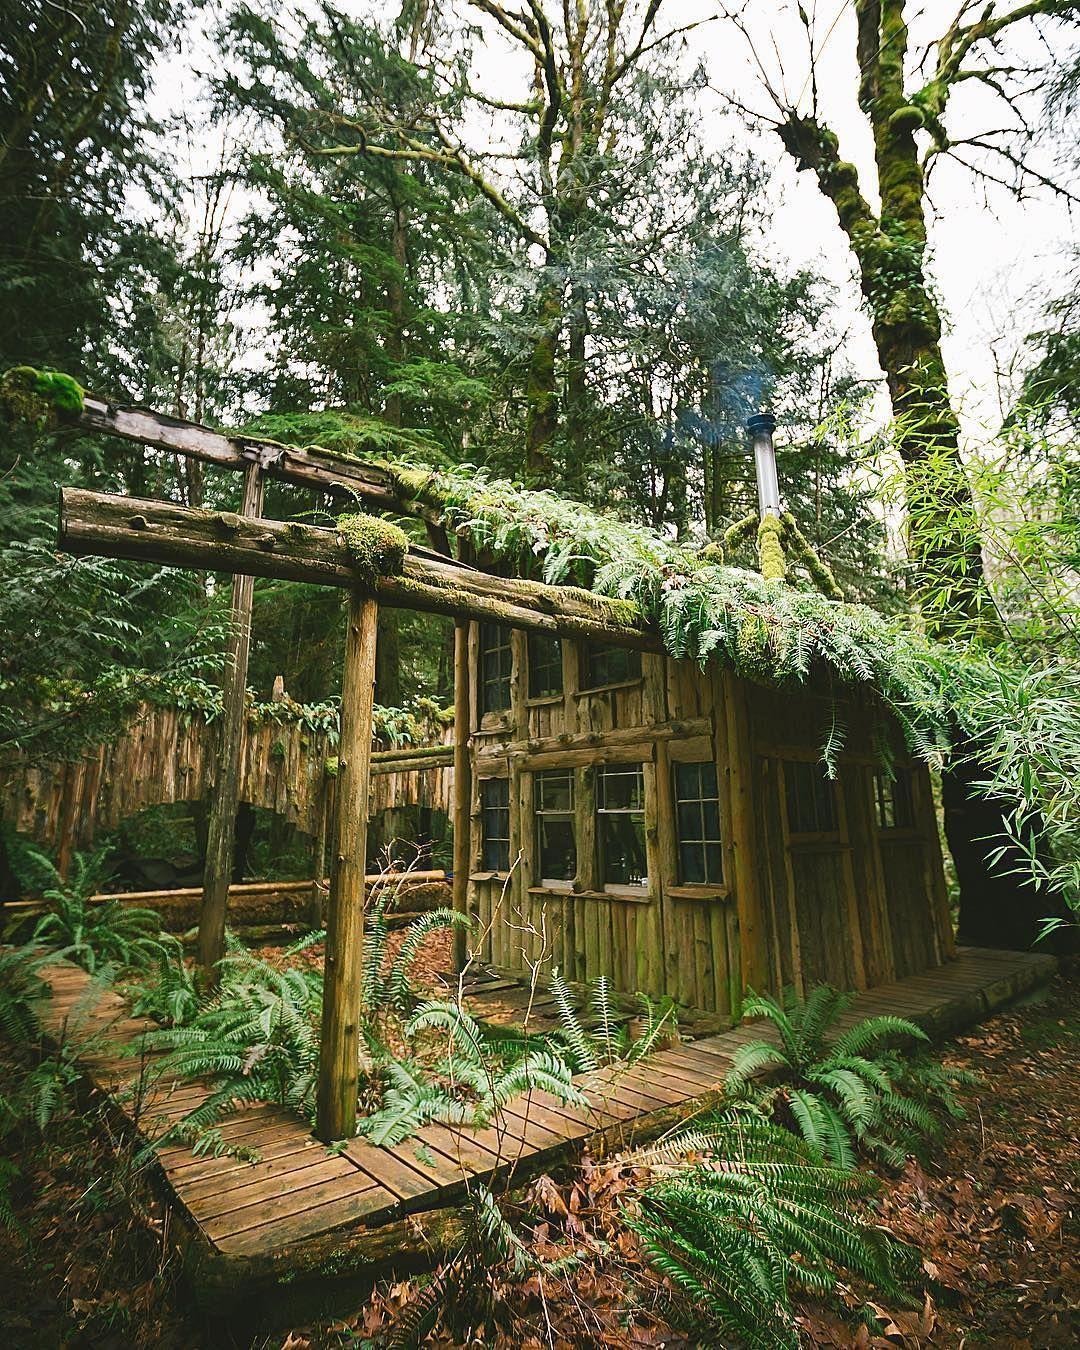 Just another badass #Washington cabin! 🌲 Photo by @matthewpastula Share your story: #roamtheplanet